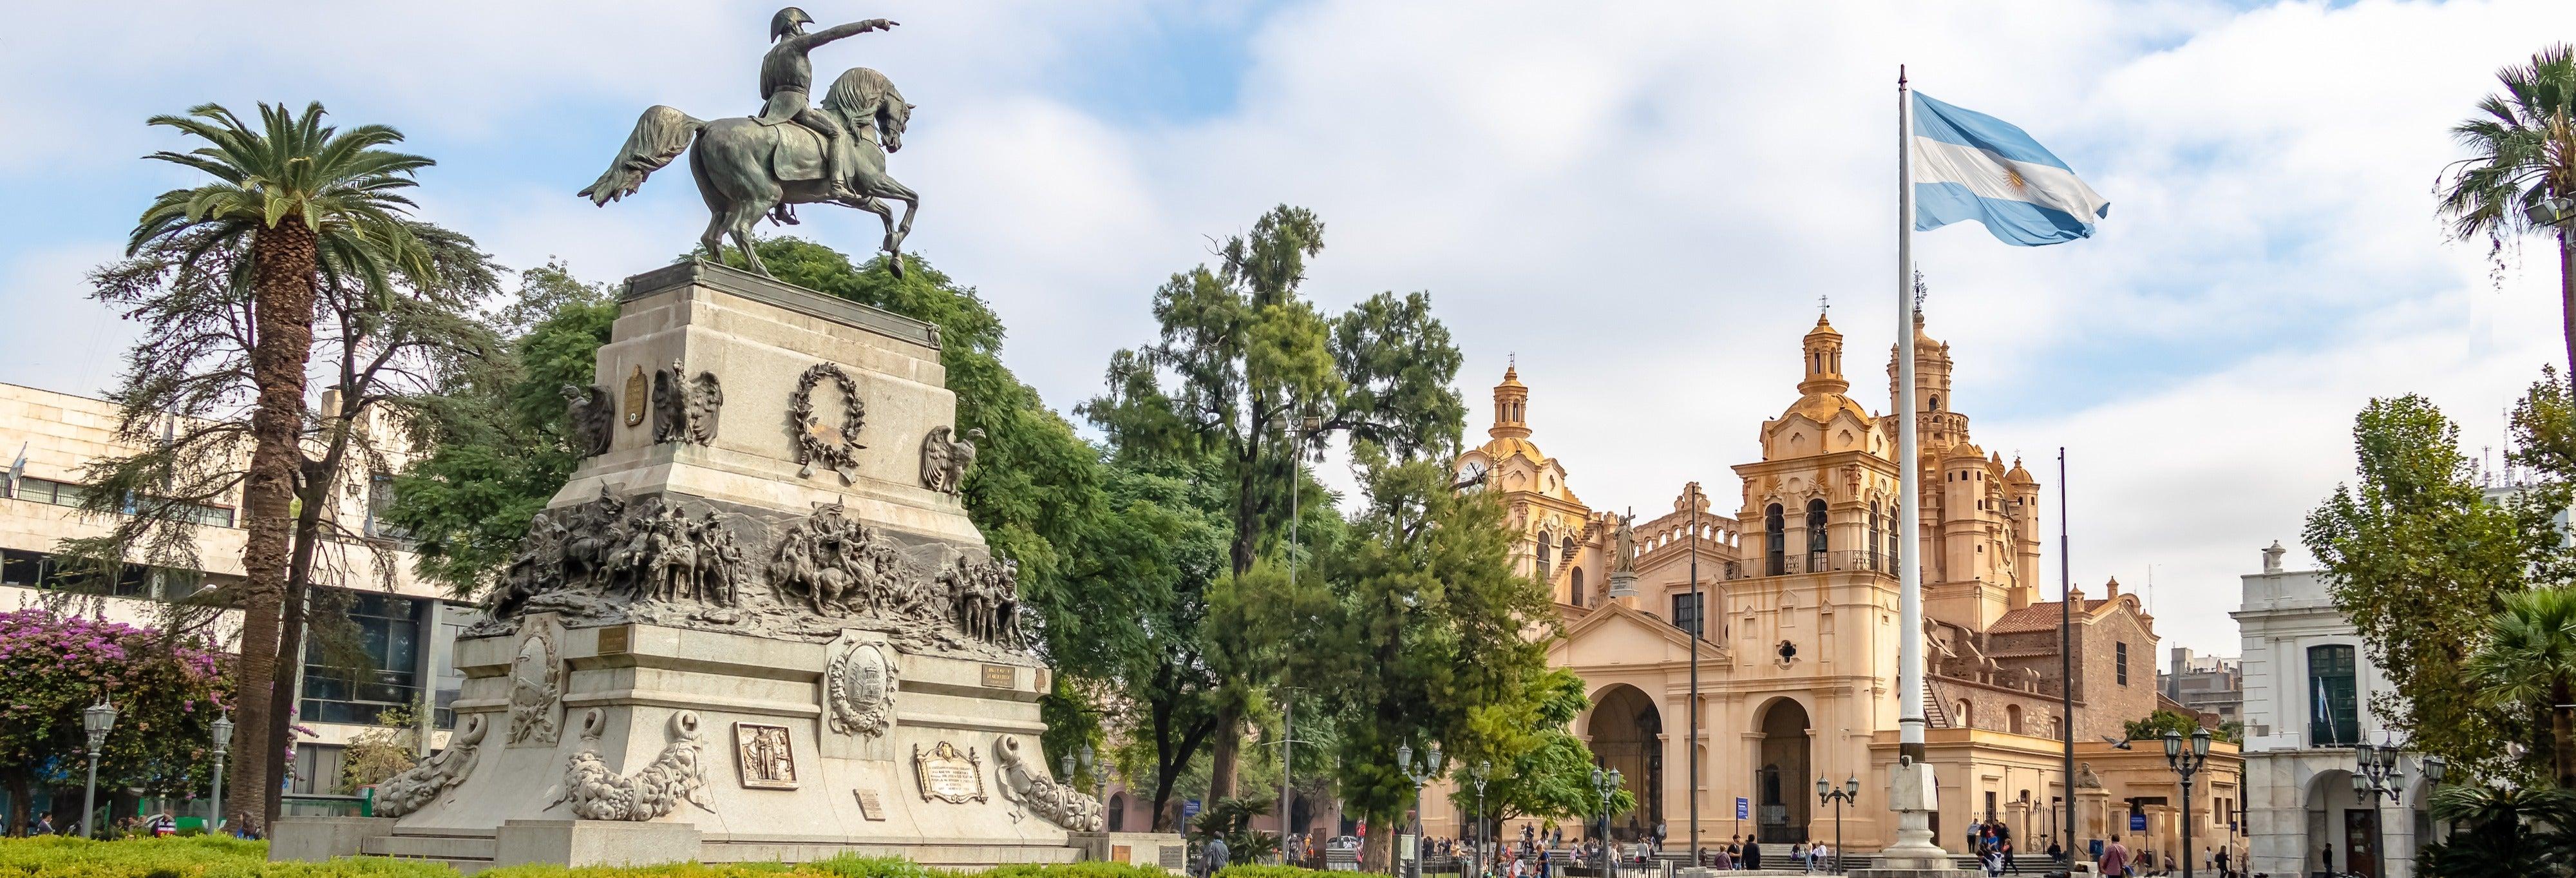 Tour de Córdoba al completo